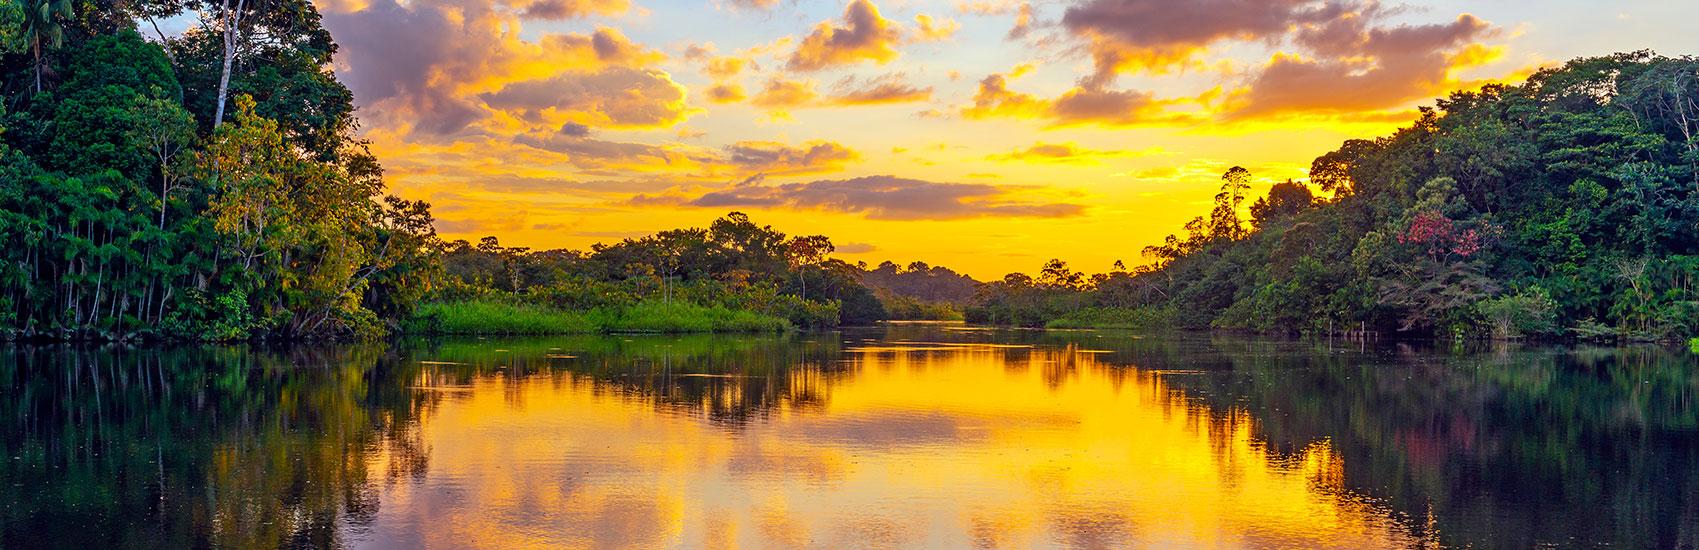 Sensational South America with Oceania Cruises